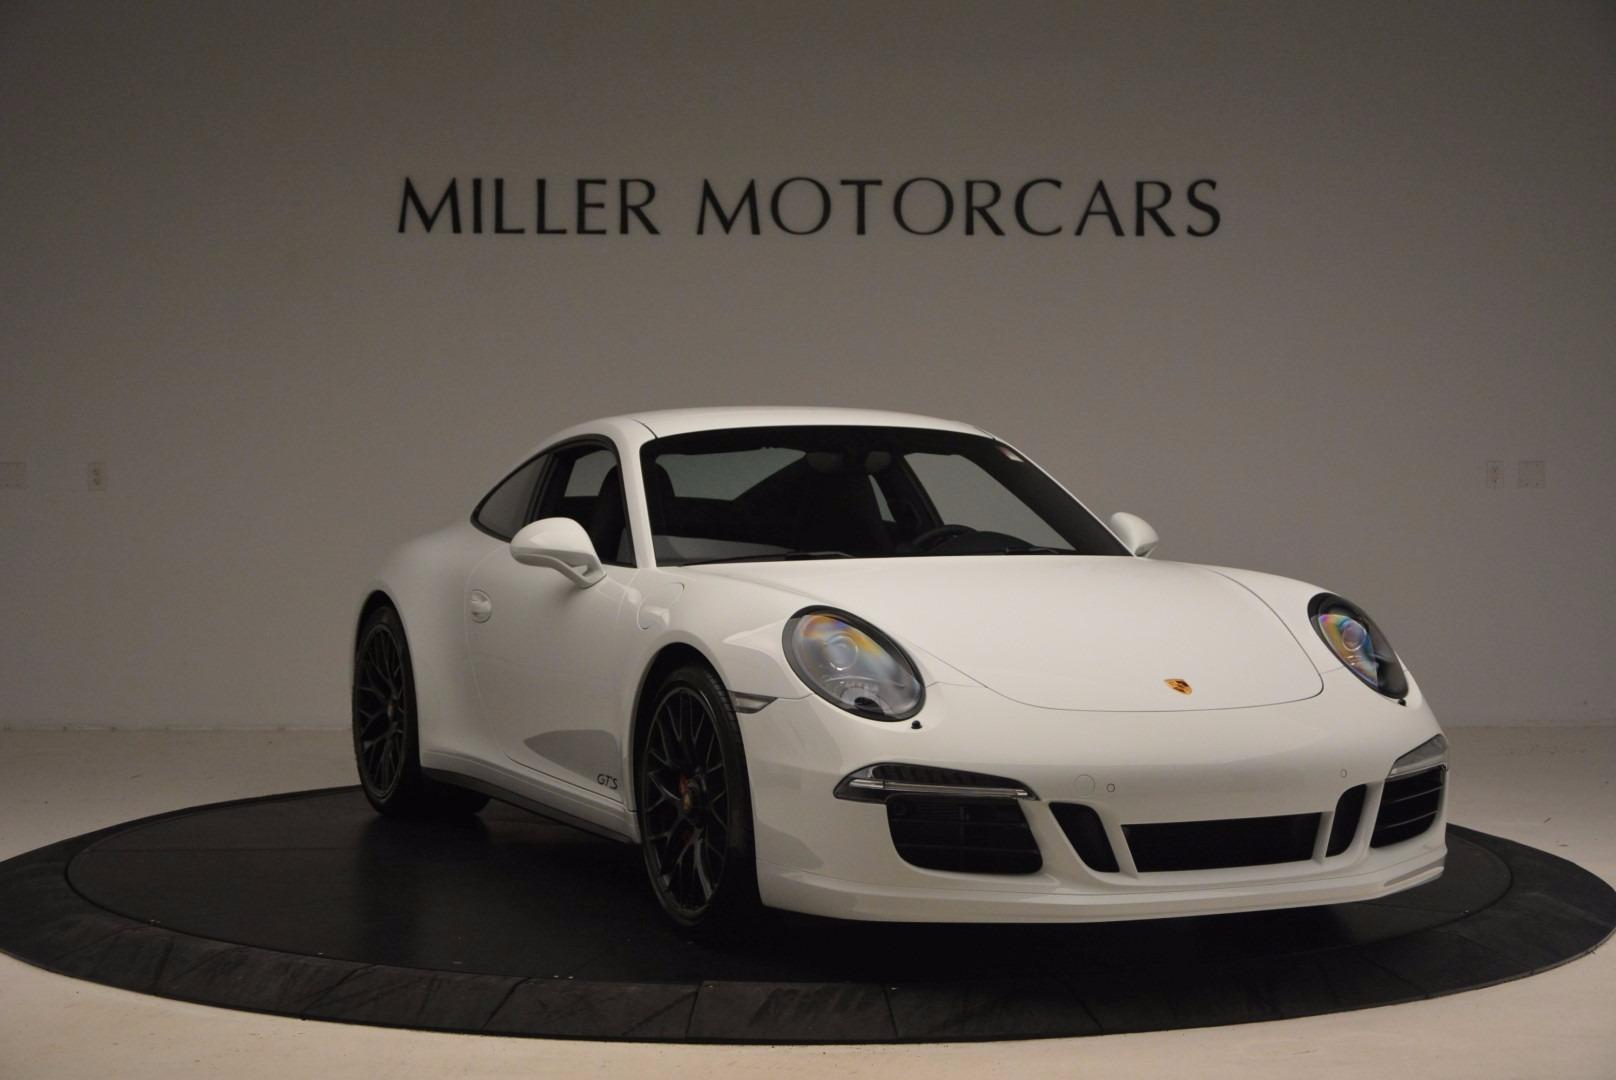 Used 2015 Porsche 911 Carrera GTS For Sale In Greenwich, CT 1444_p12